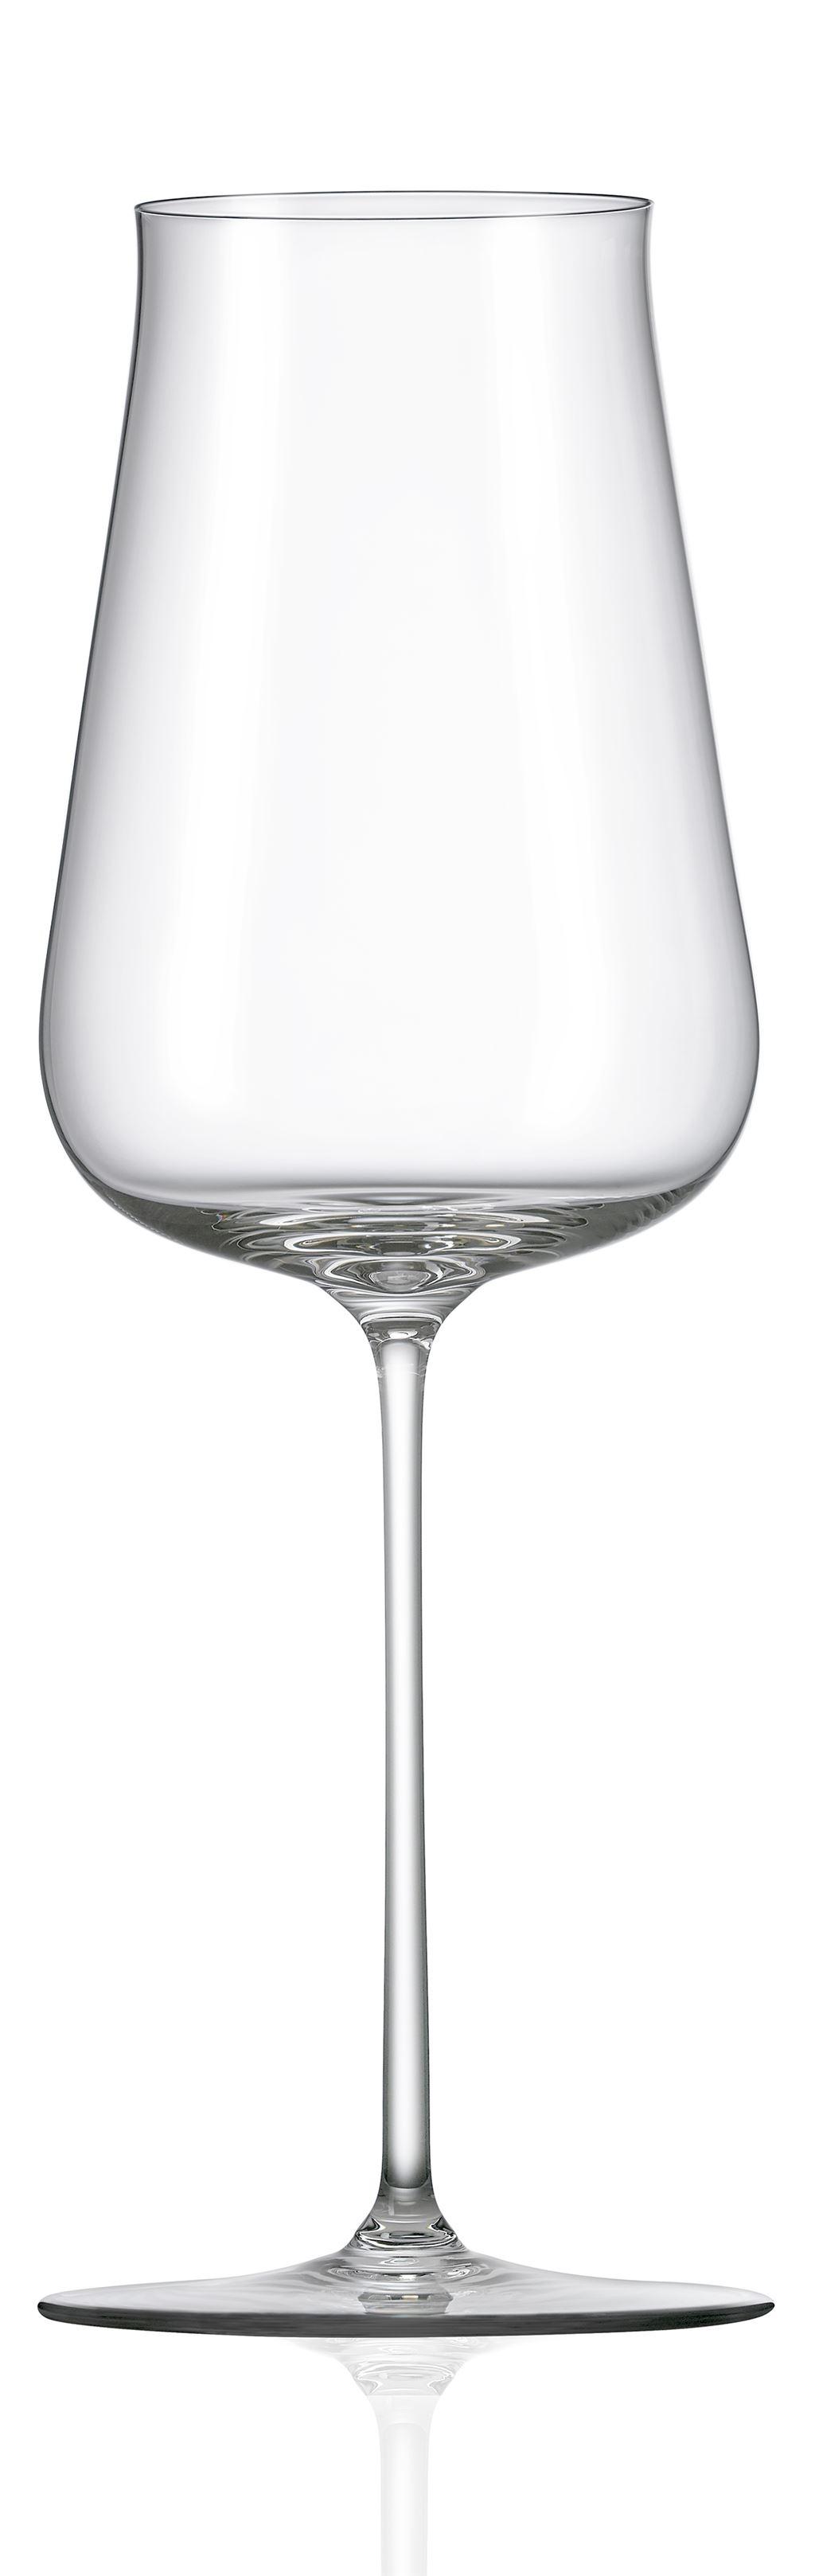 Polaris grt kelih 2/1 450 ml vino